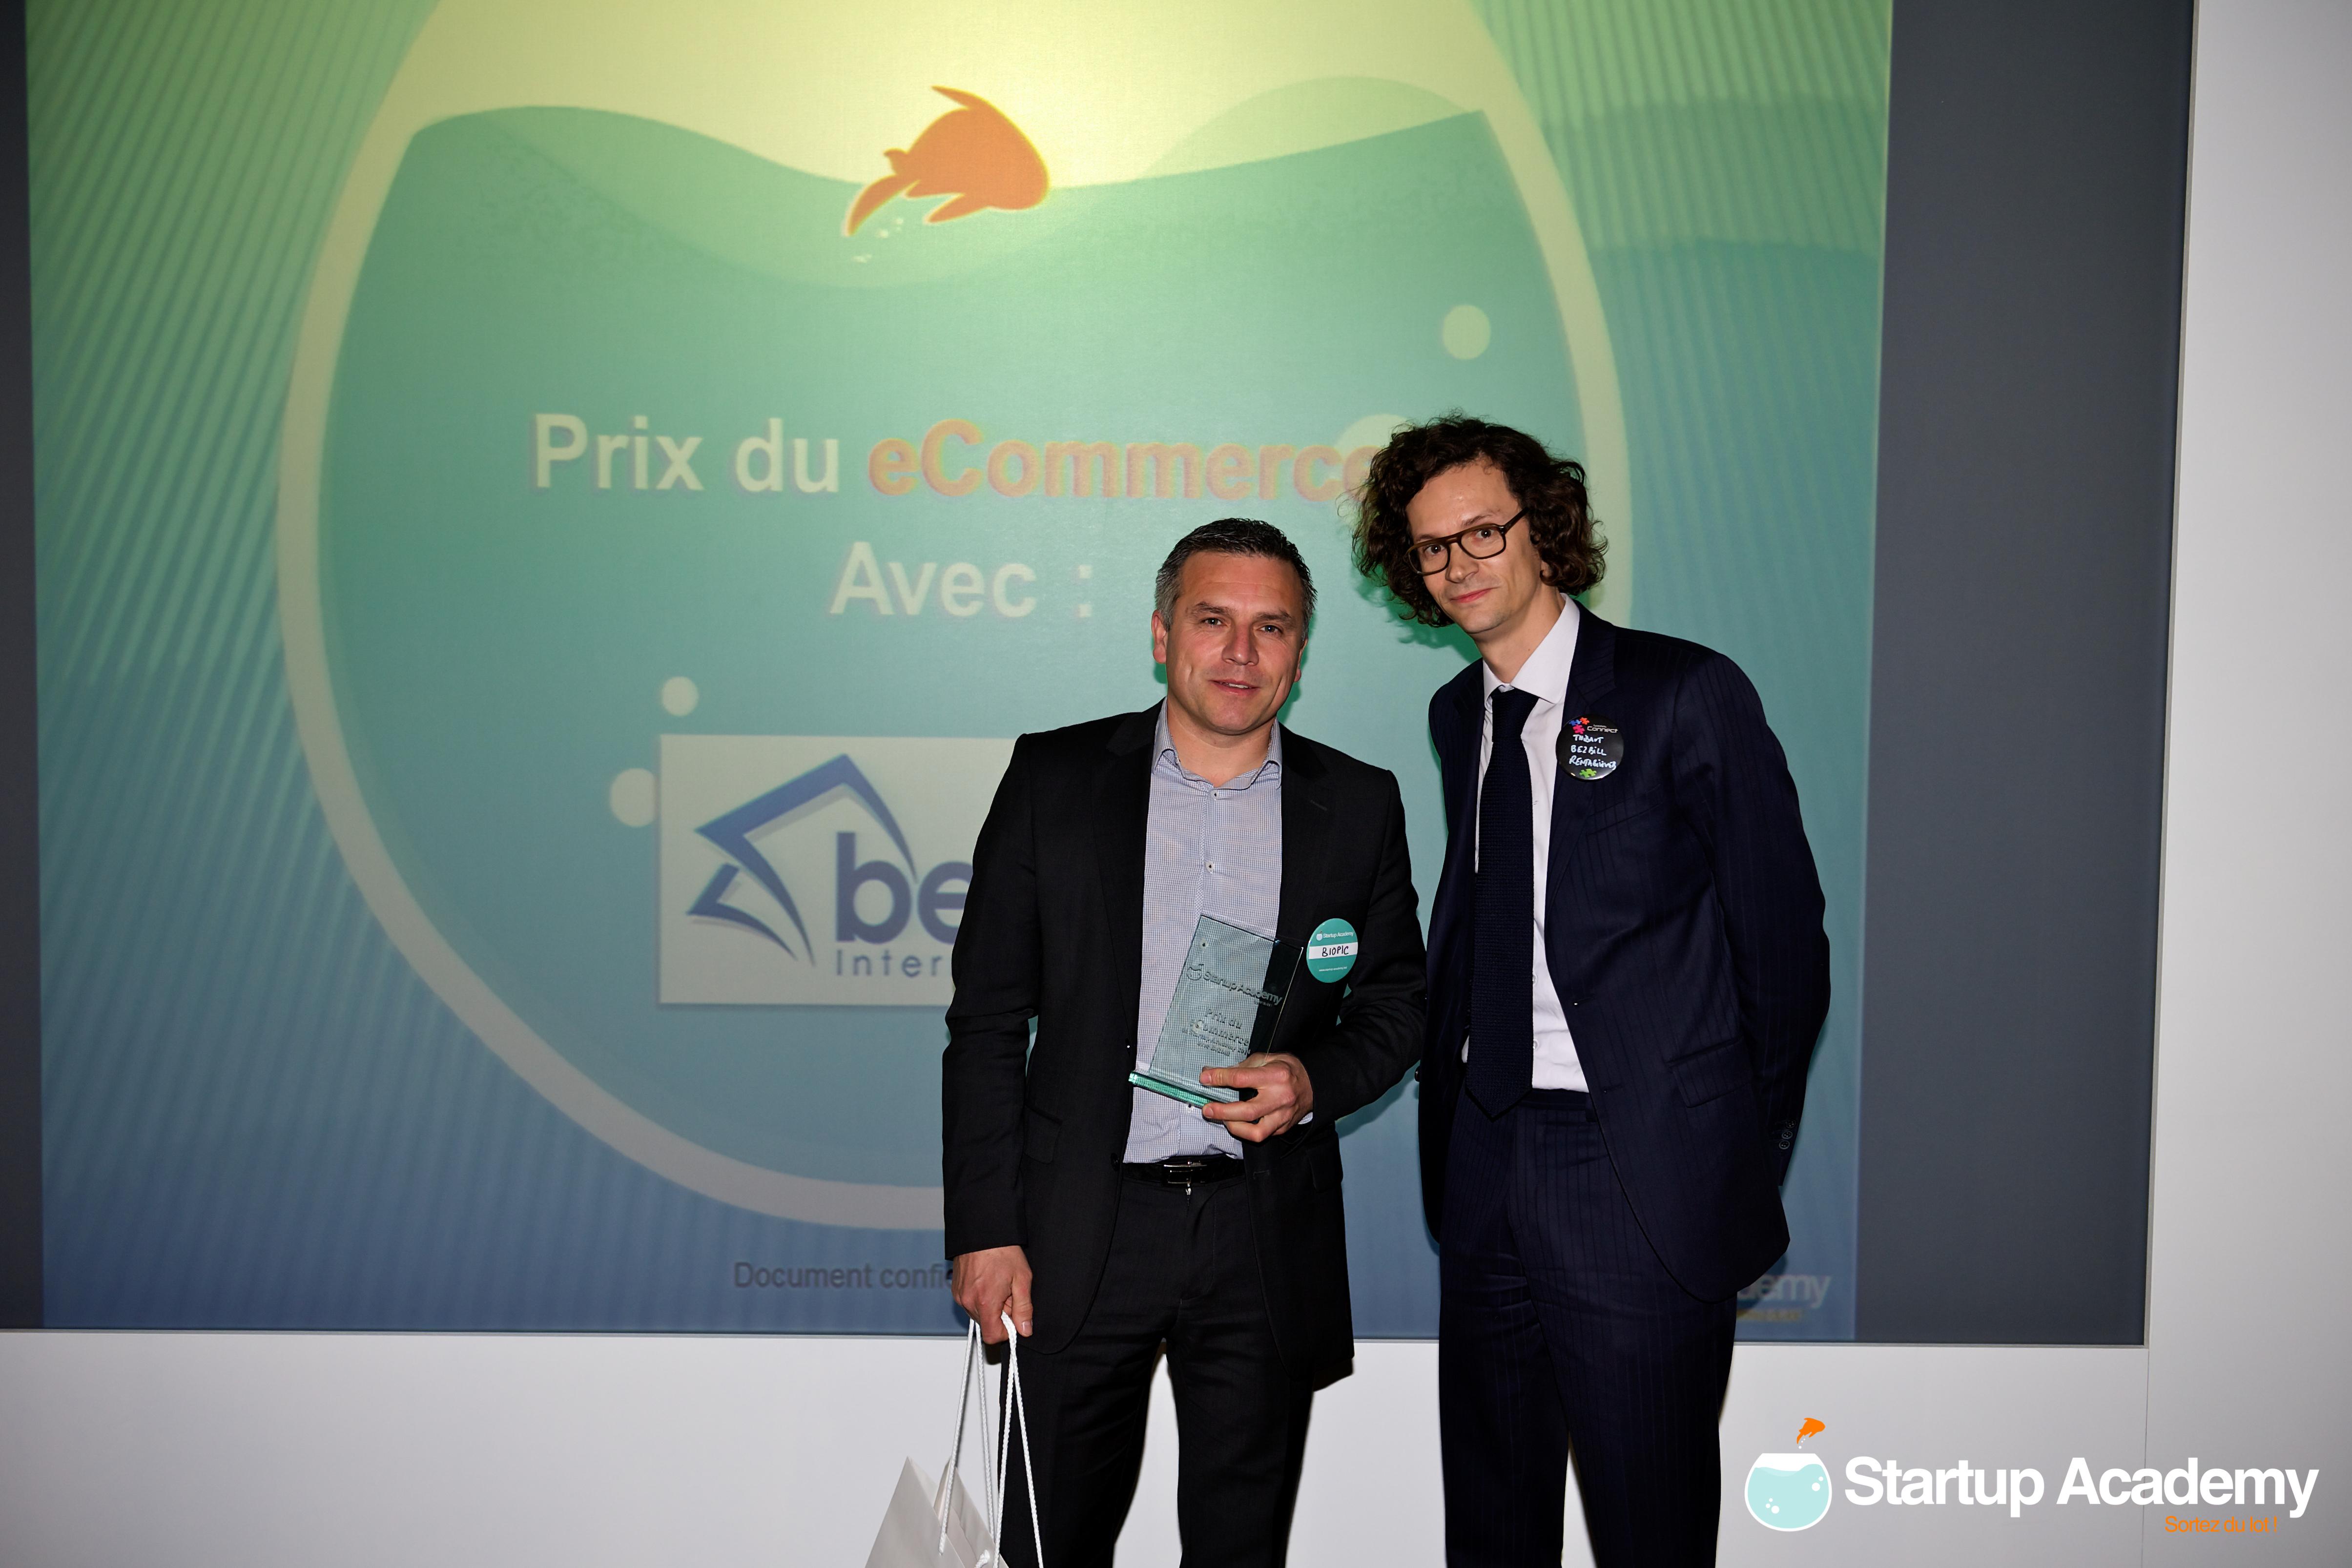 Prix du ecommerce avec Be2bill – Biopic